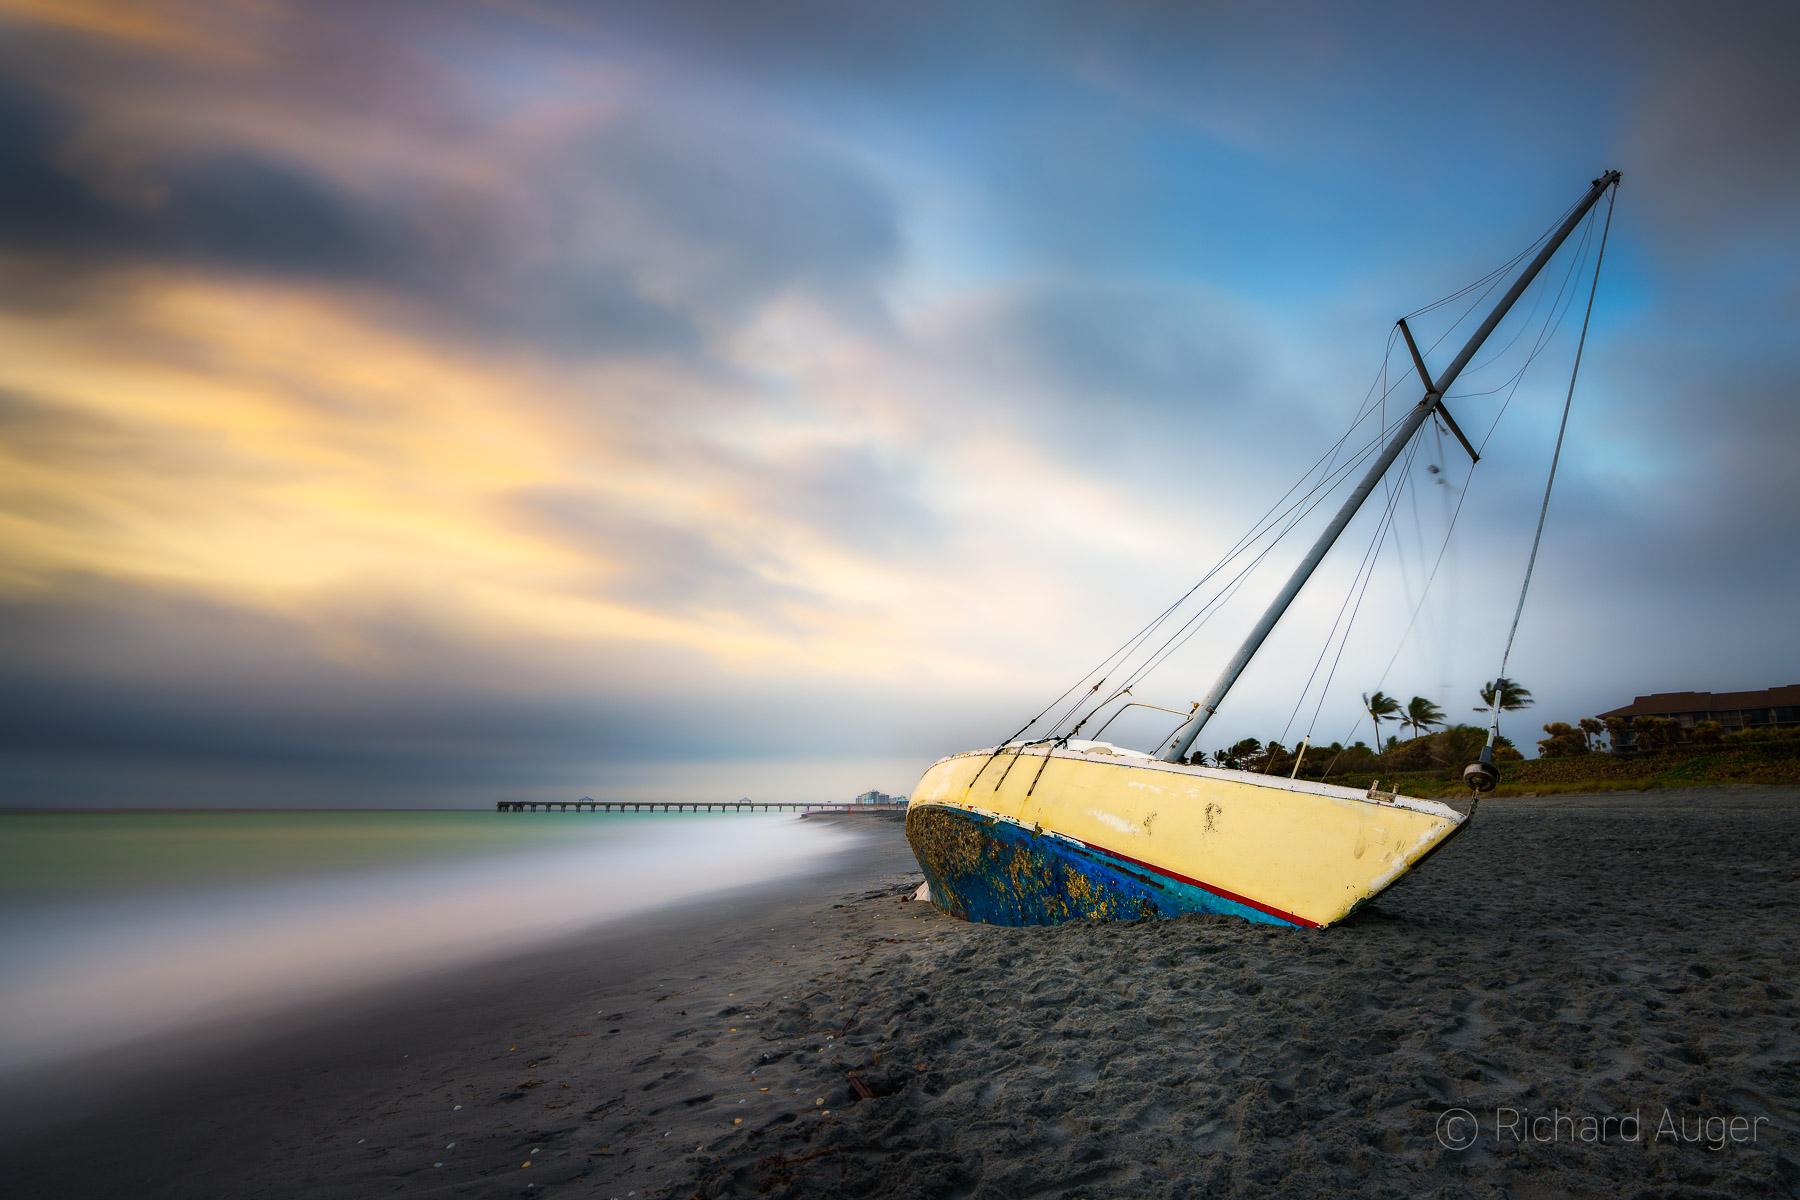 Shipwreck, Juno Beach, Florida, Long Exposure, Storm, Morning